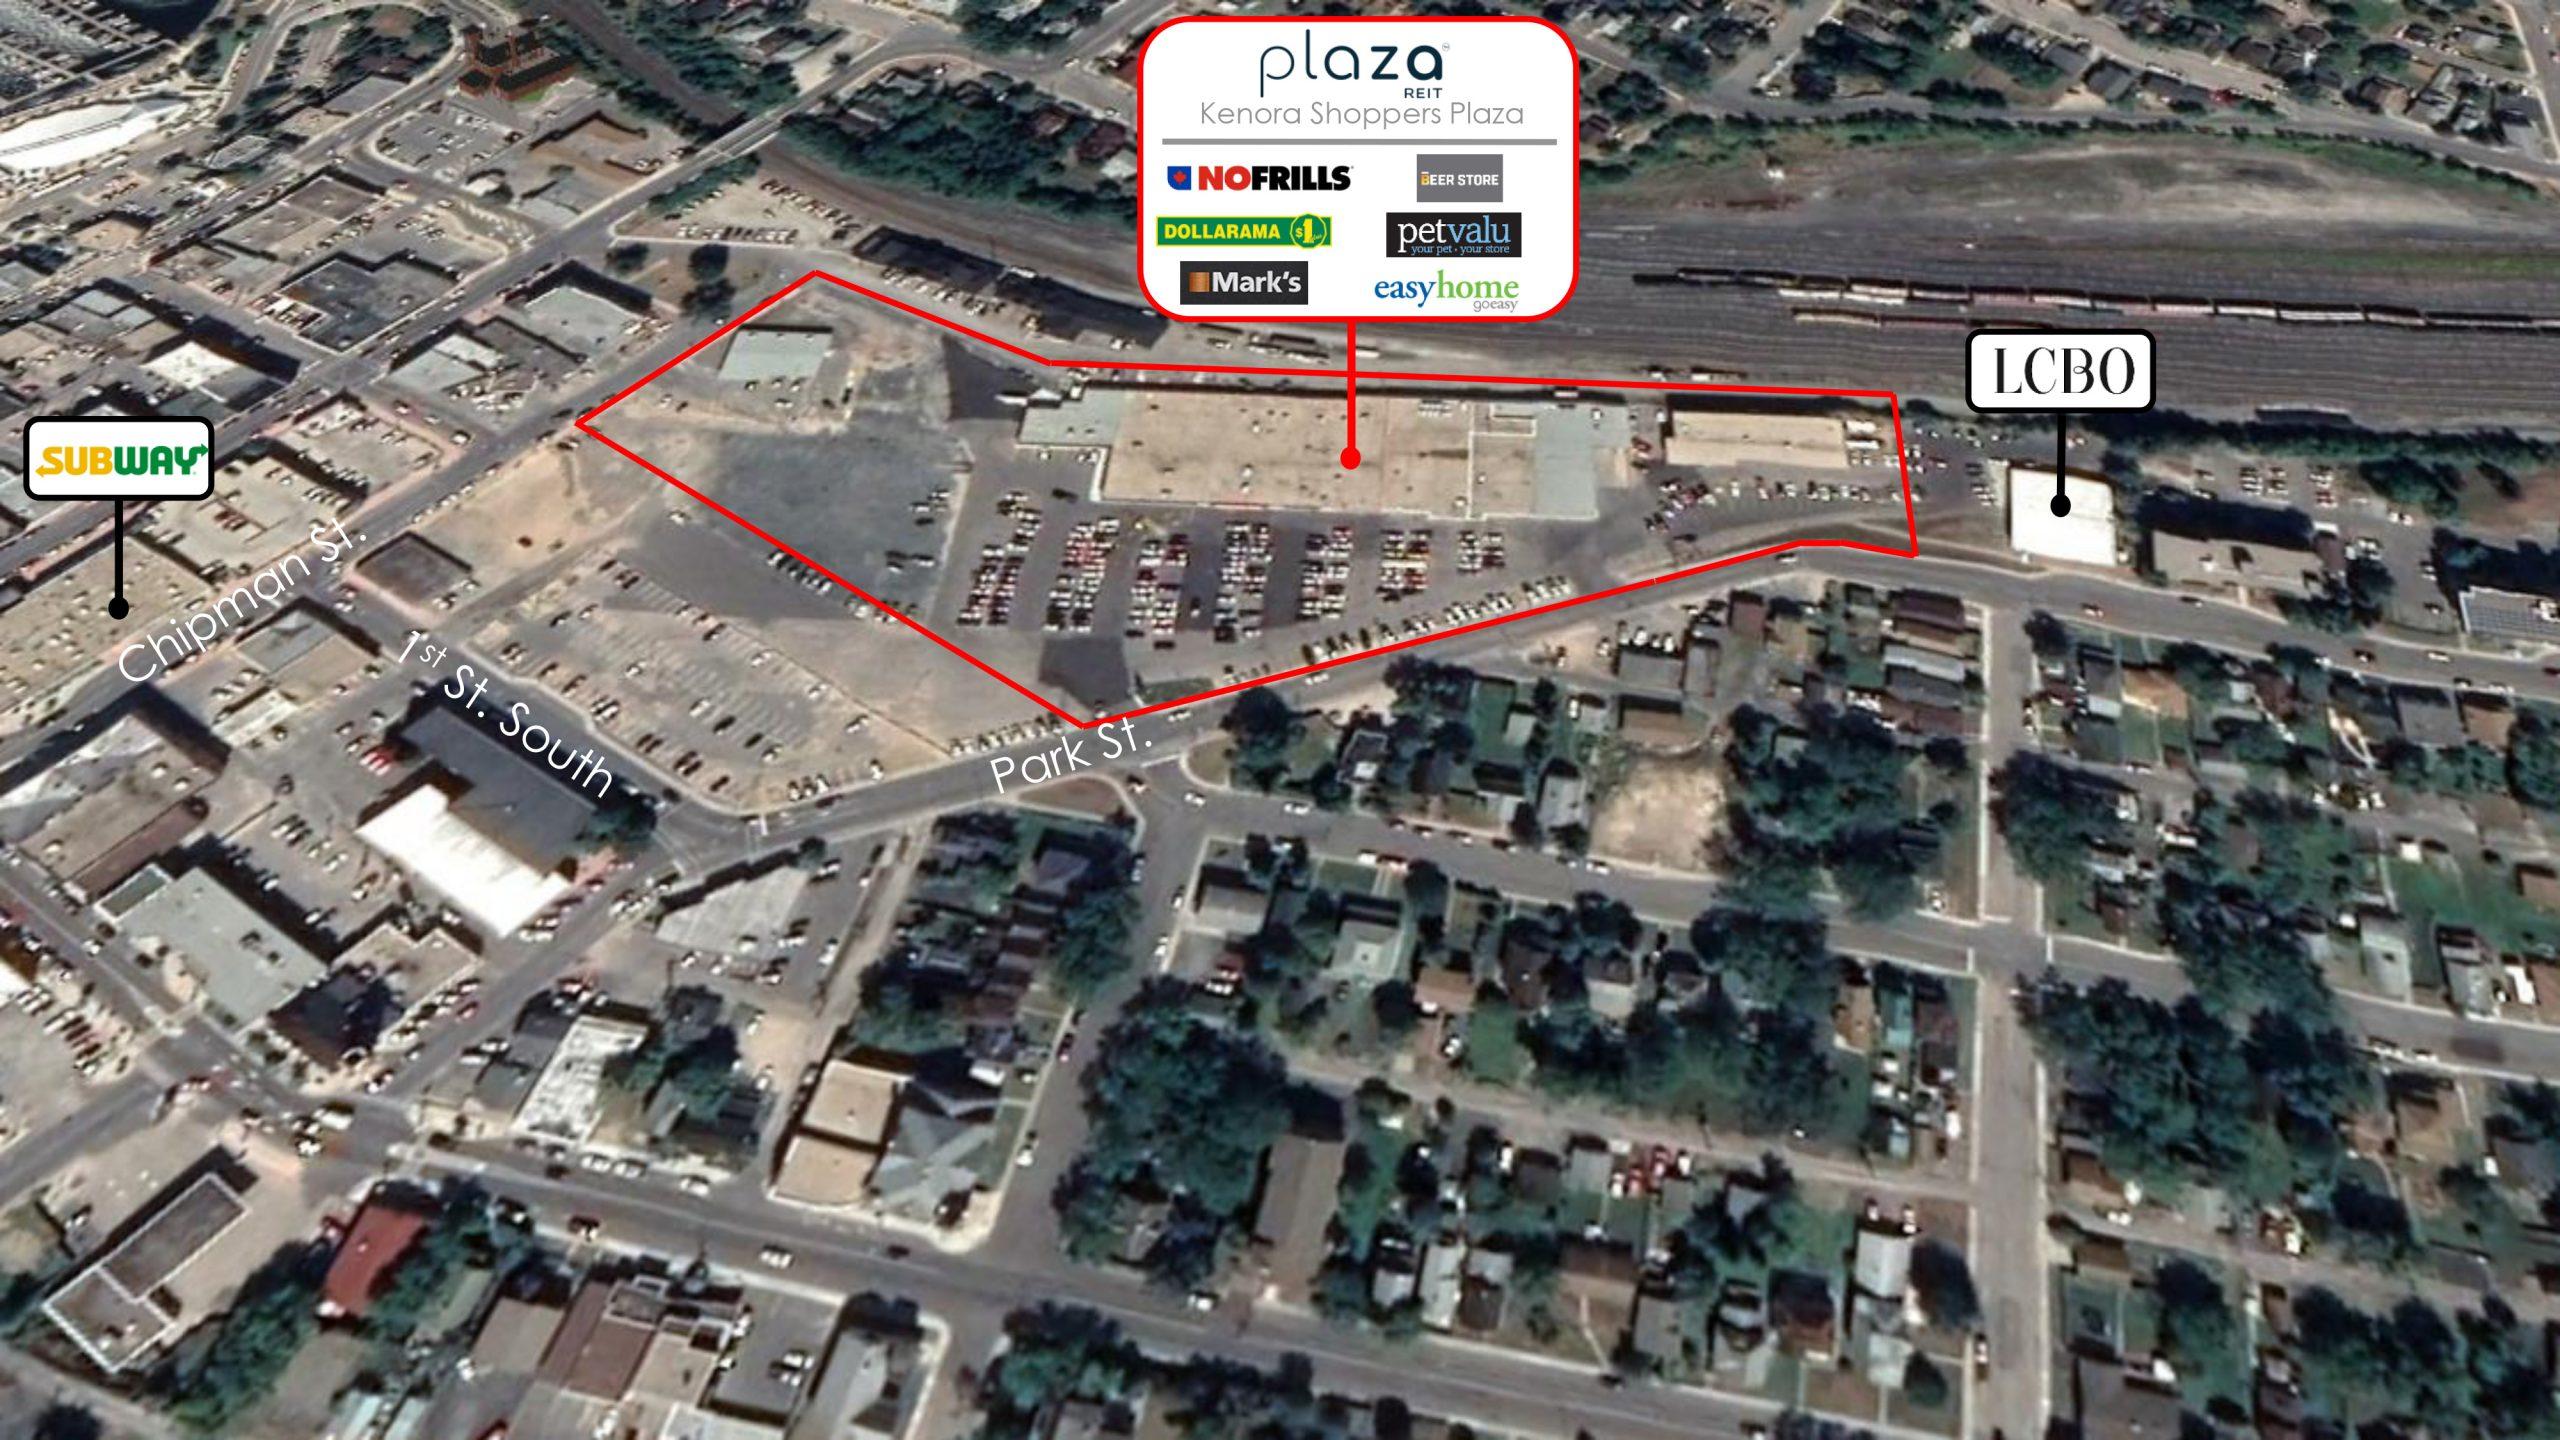 Kenora Shoppers Plaza